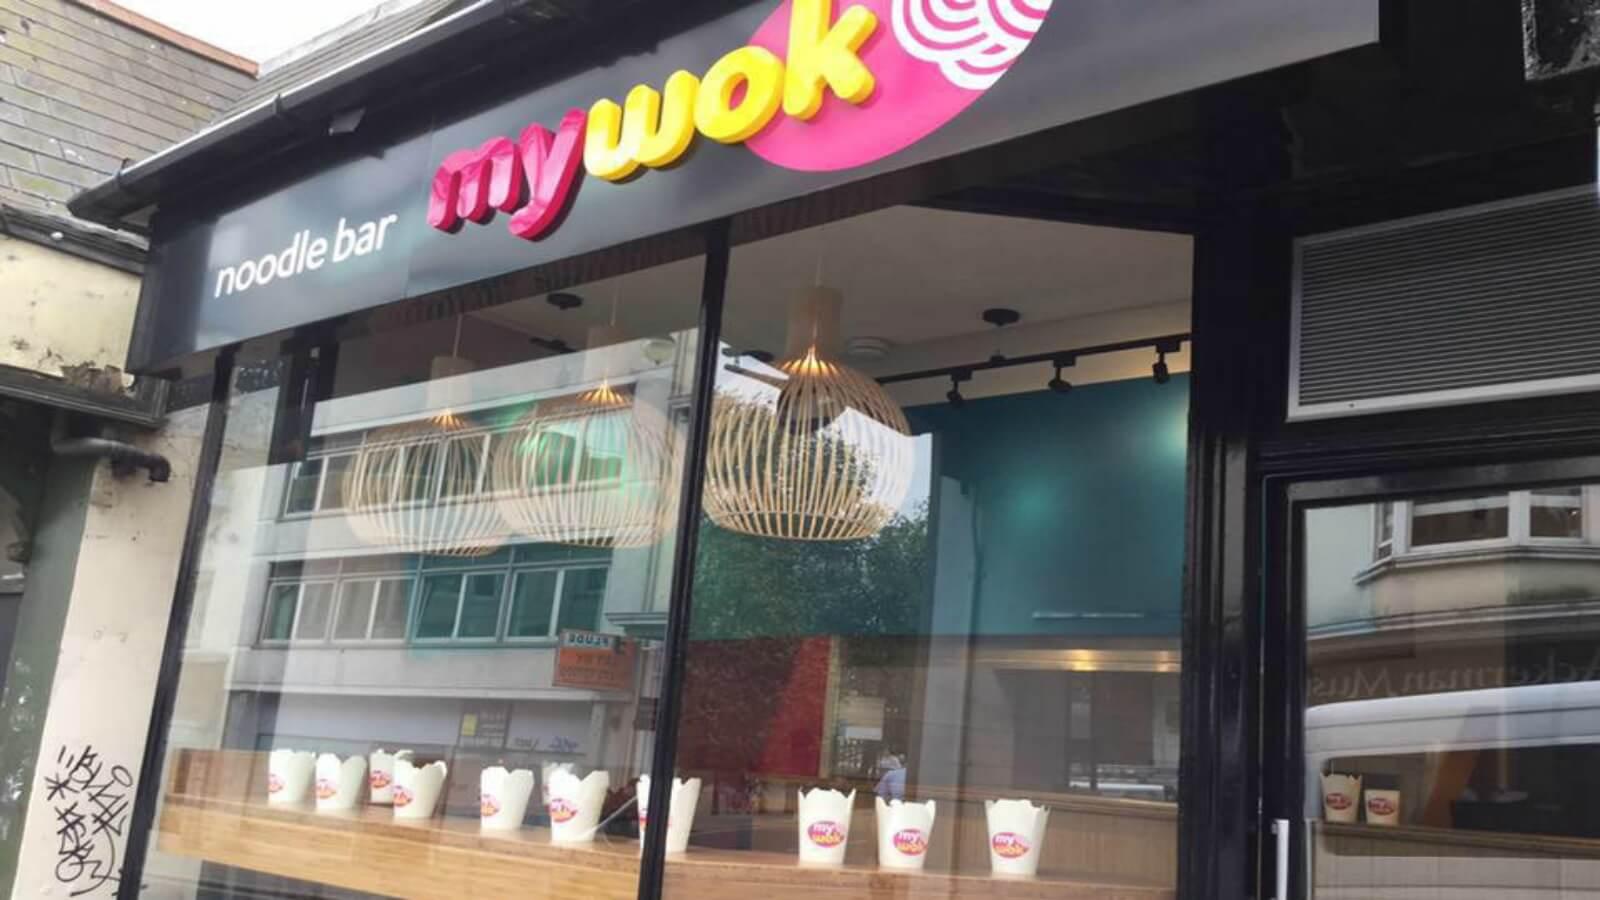 MYWOK noodle bar